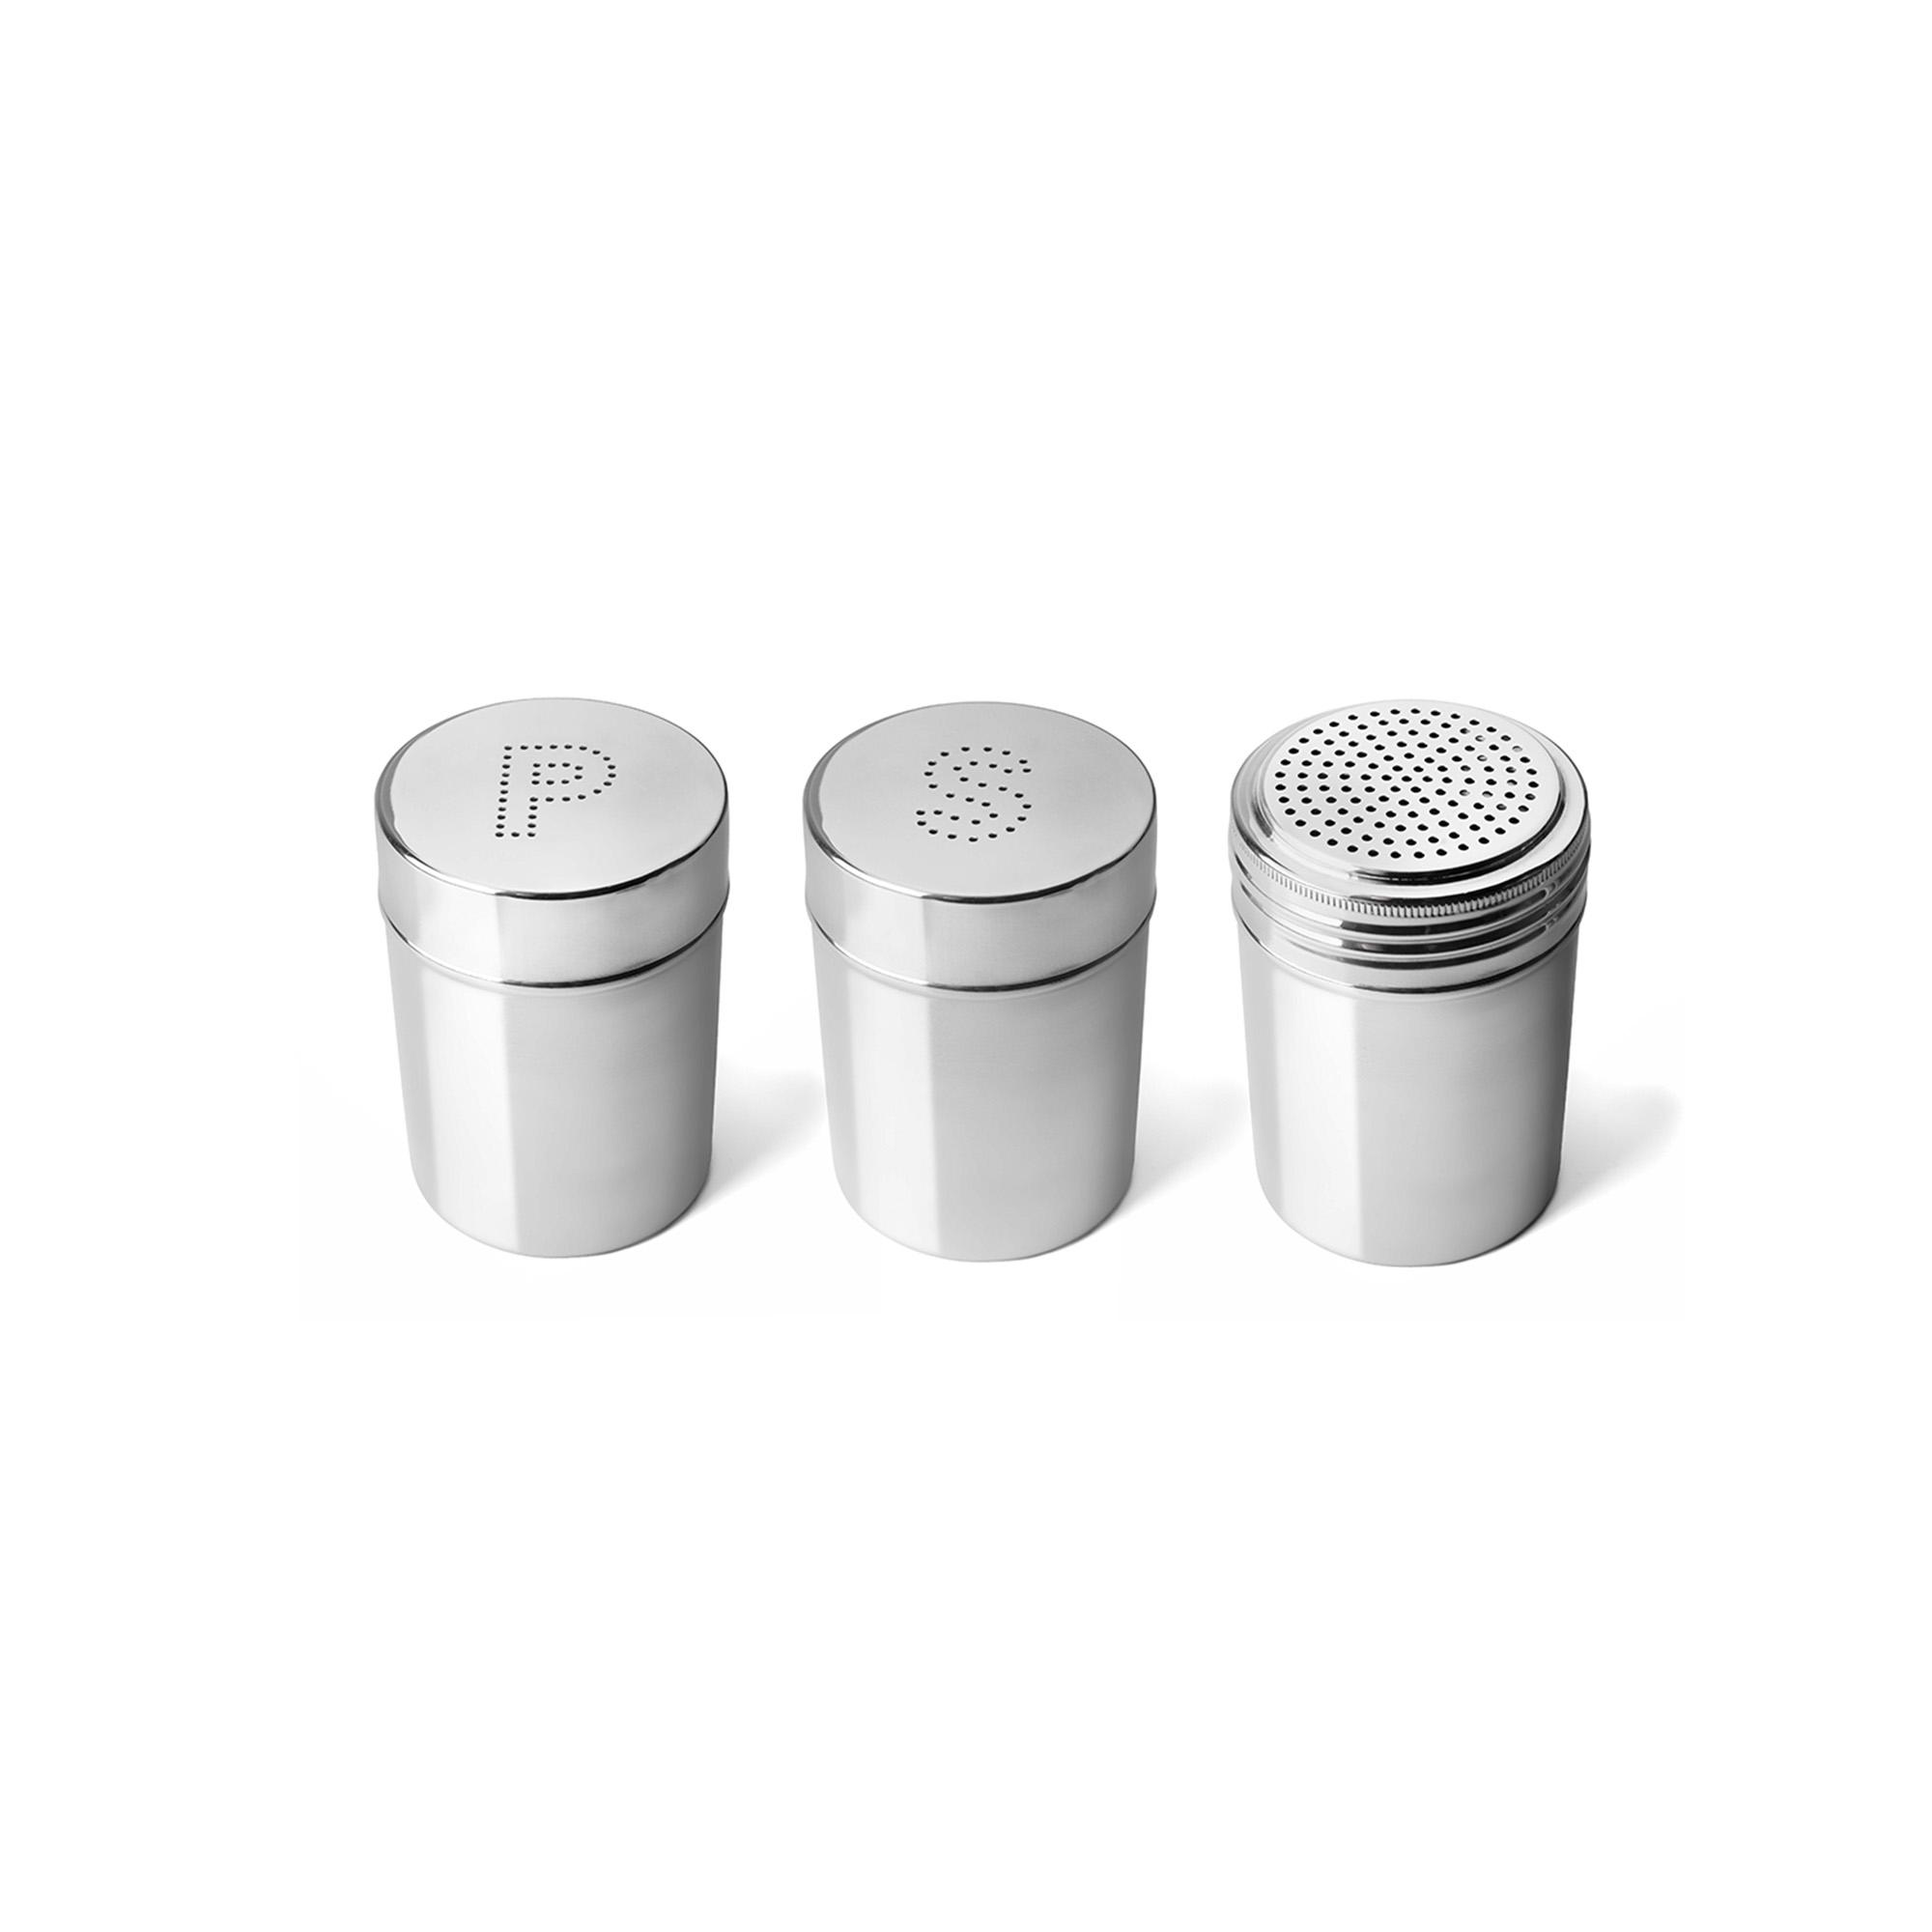 Conjunto para Temperos 3 peças Sal, Pimenta 320ml Inox Attuale